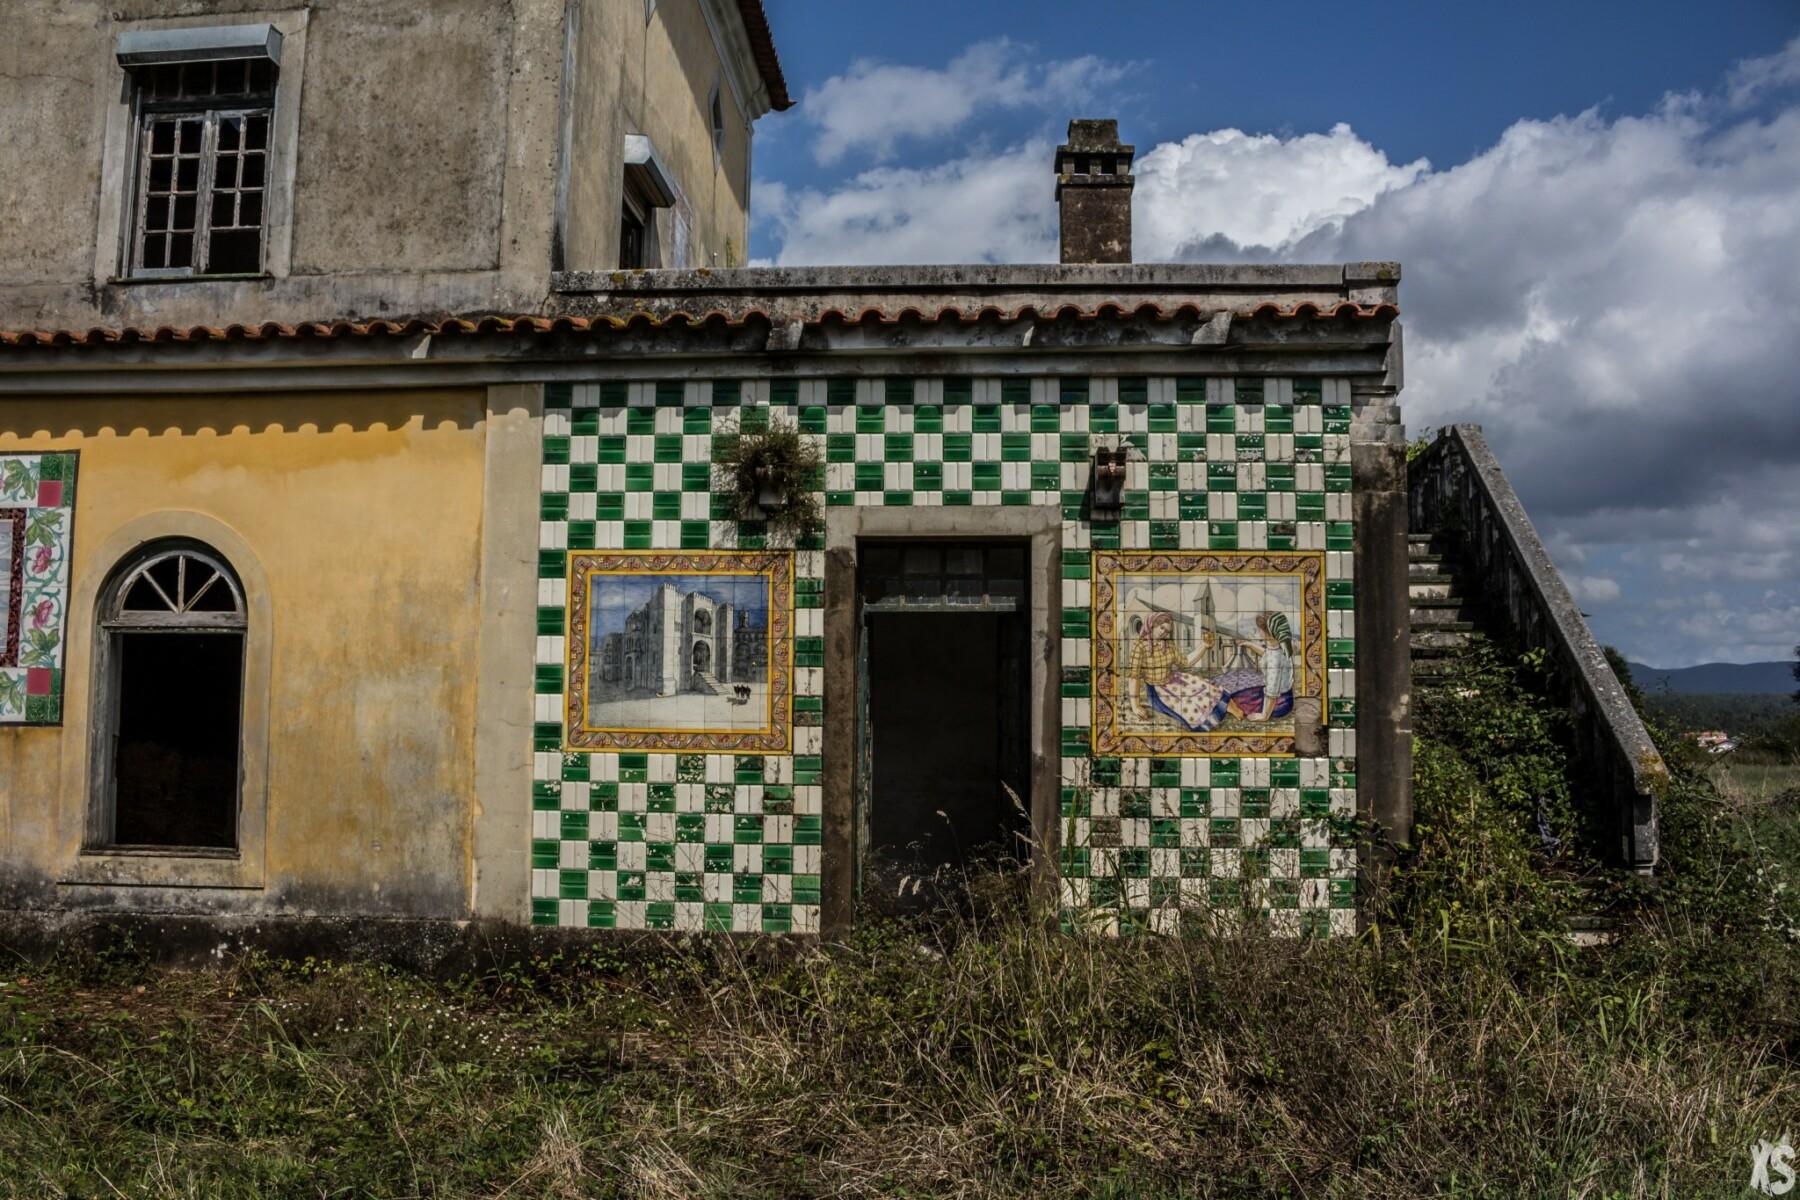 palais-louise-vermilyea-12